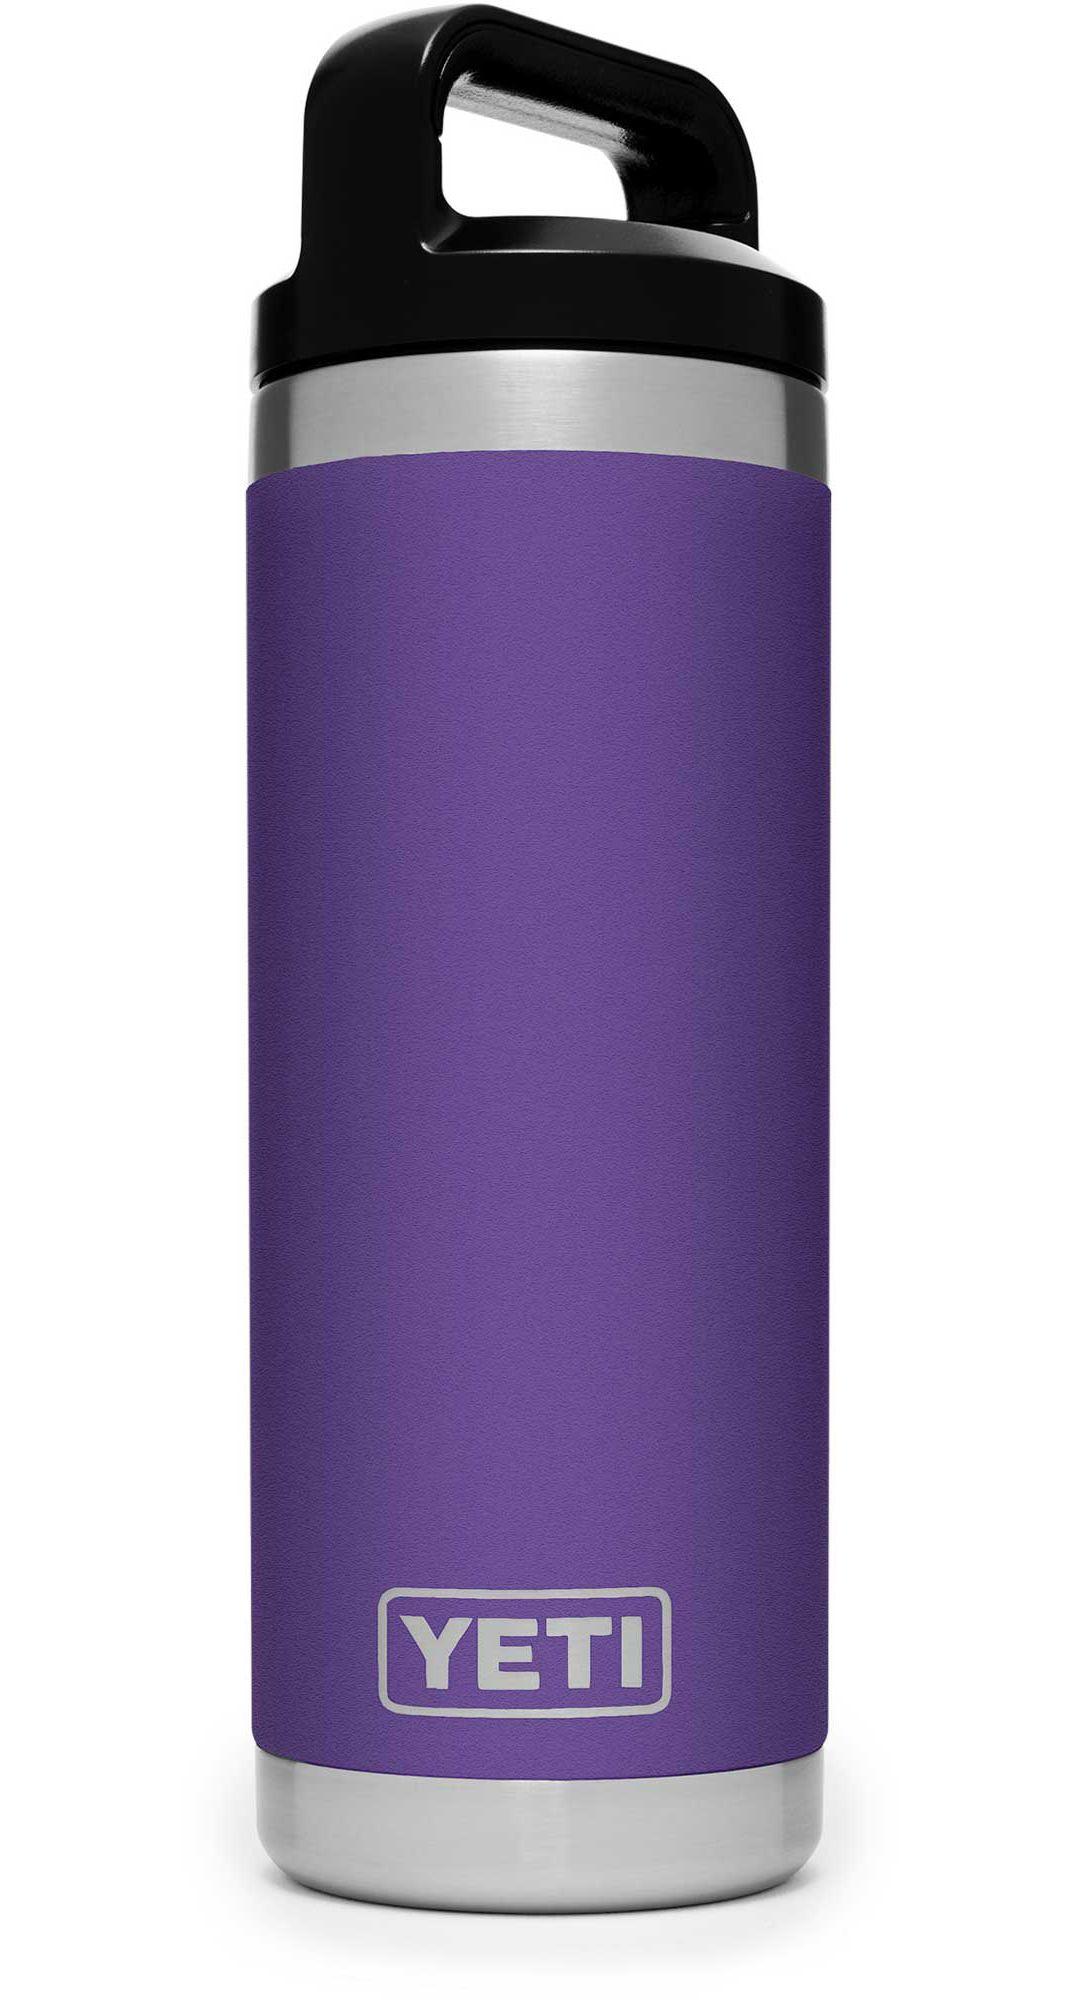 2280ca4b1c8 YETI 18 oz. Rambler Bottle | DICK'S Sporting Goods